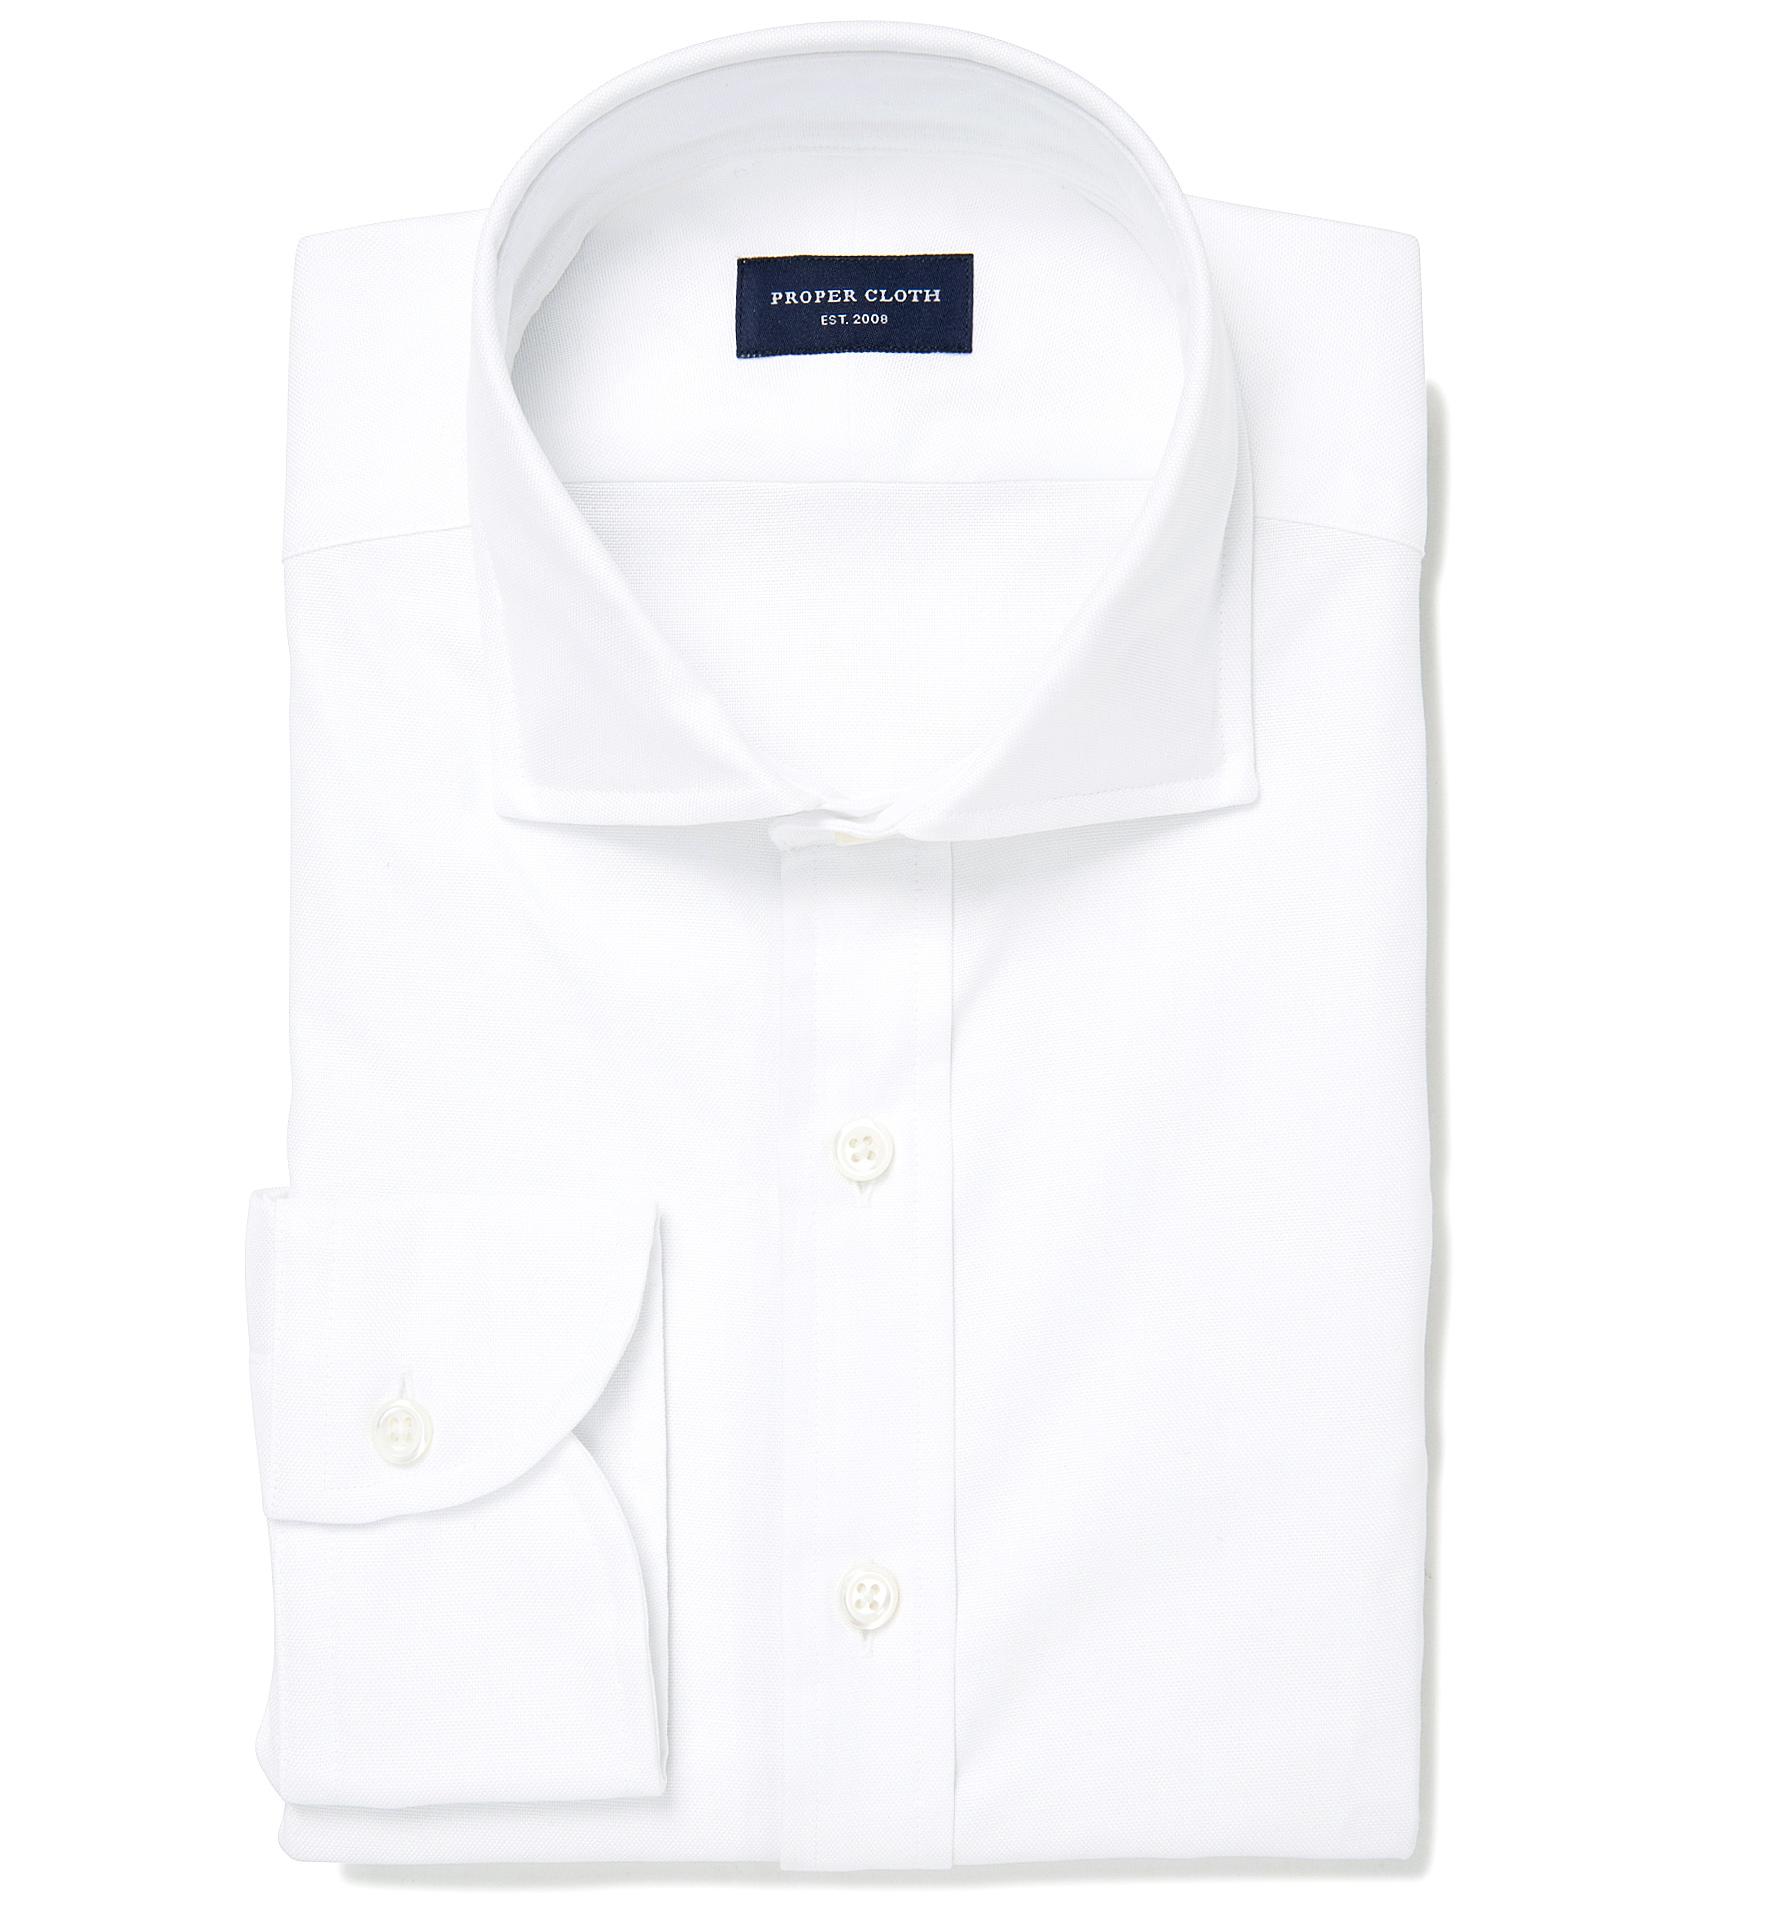 Thomas mason white oxford men 39 s dress shirt by proper cloth for Thomas mason dress shirts